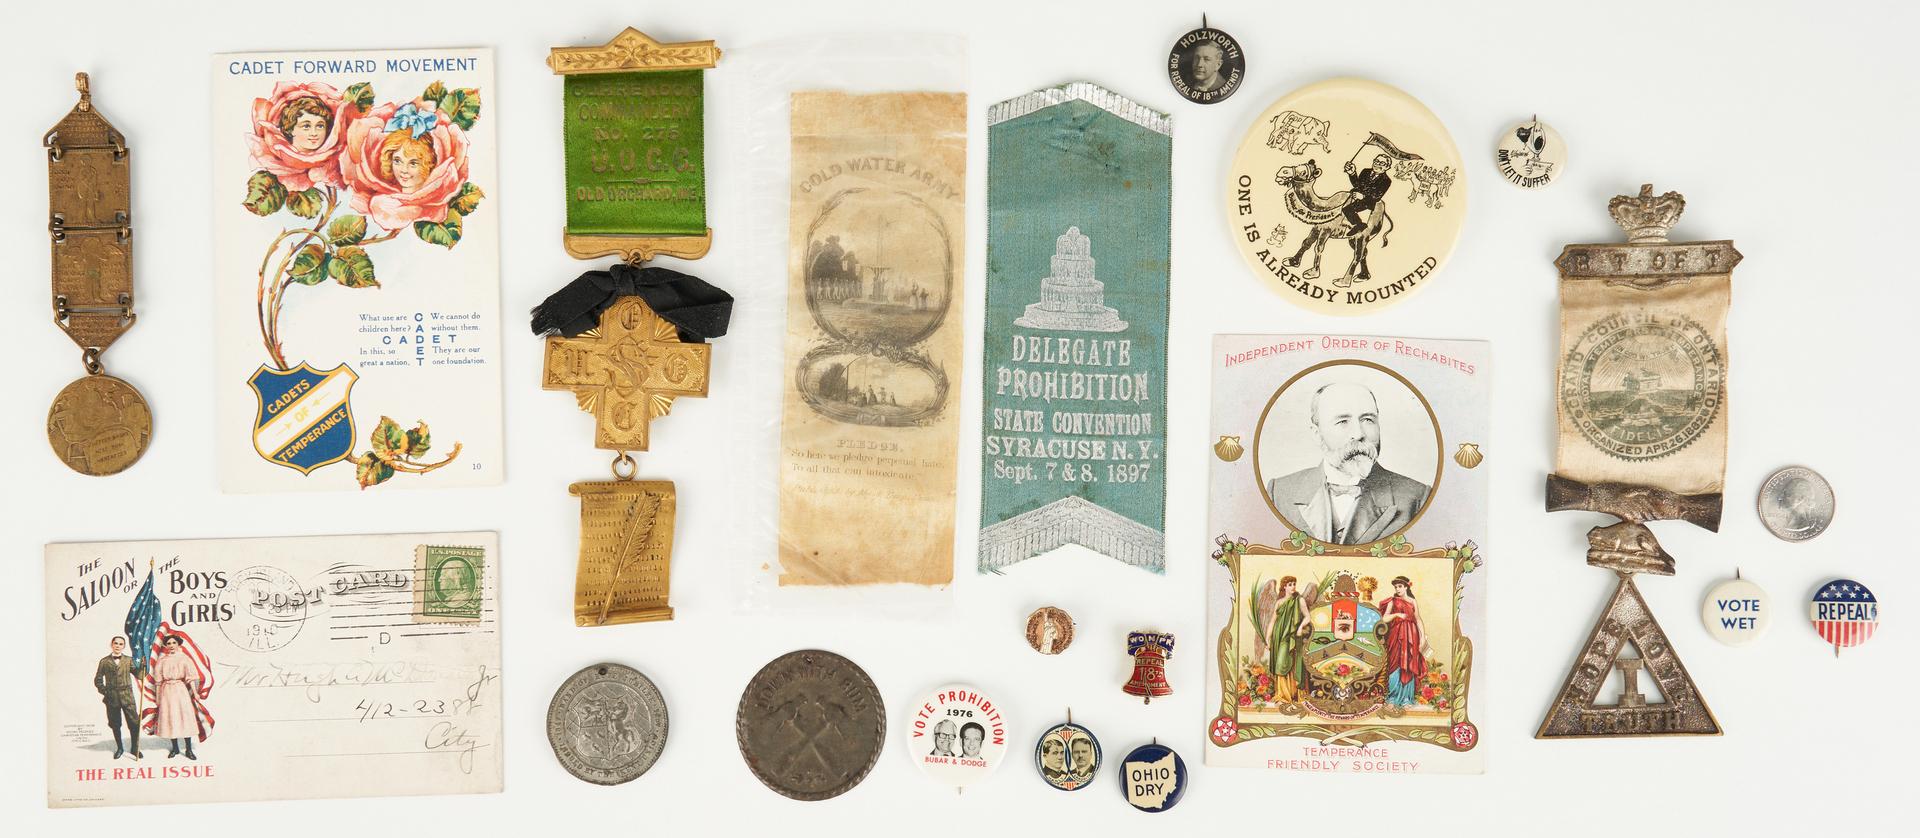 Lot 686: 52 Prohibition & Women's Suffrage Related Ephemera Items